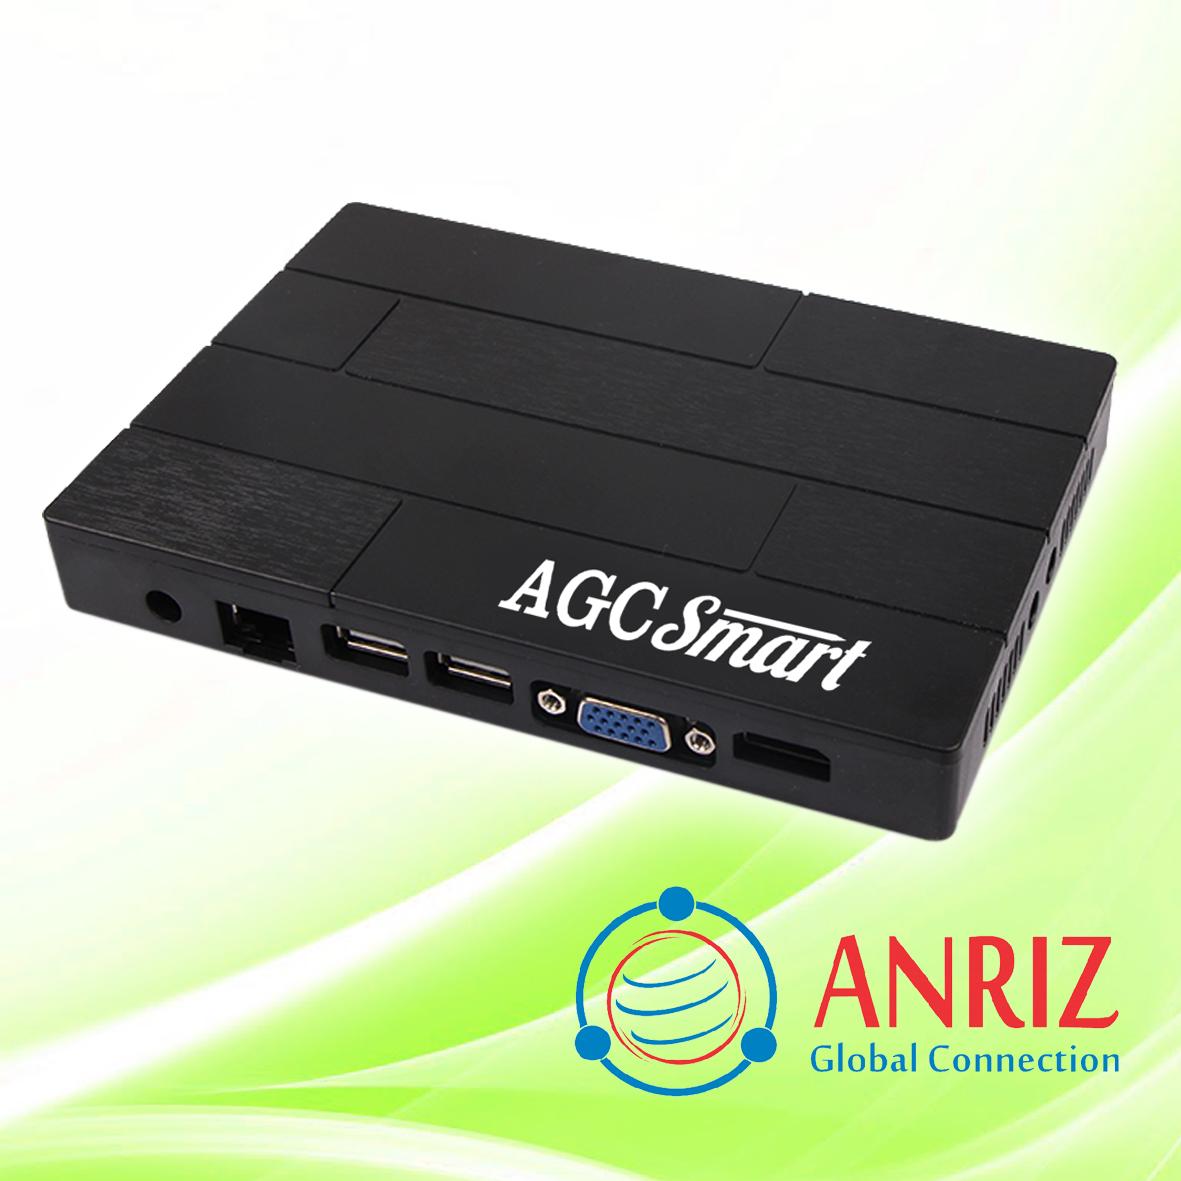 agc600l-atas (1)